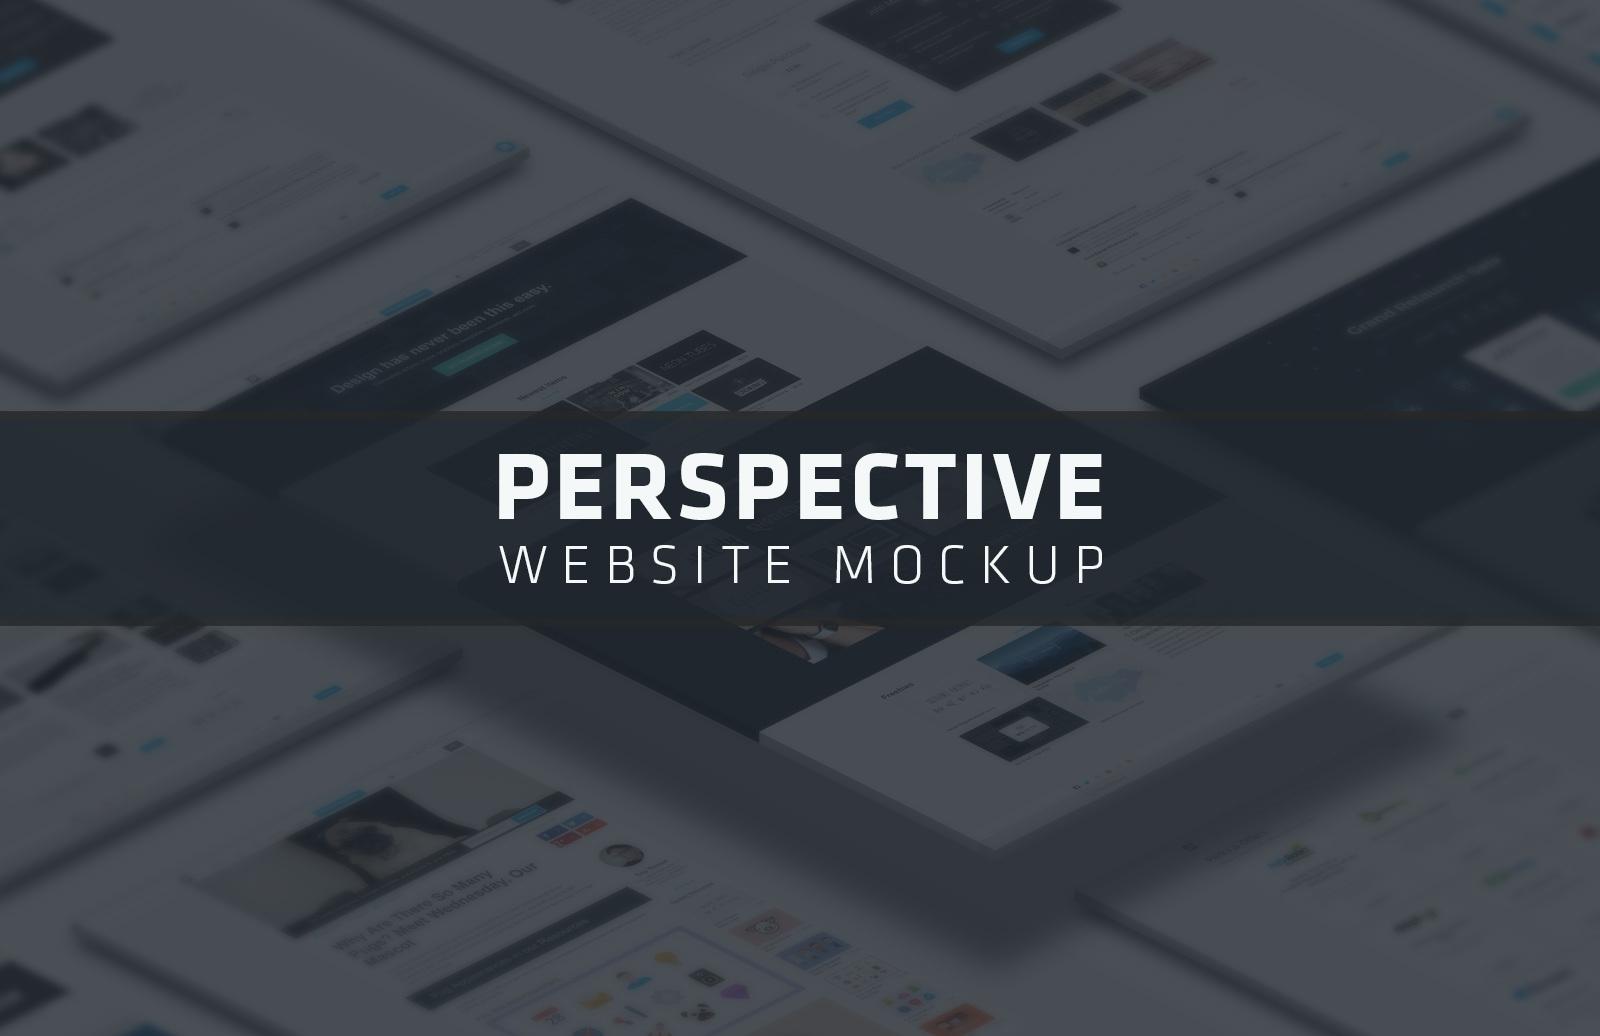 Perspective Website Mockup